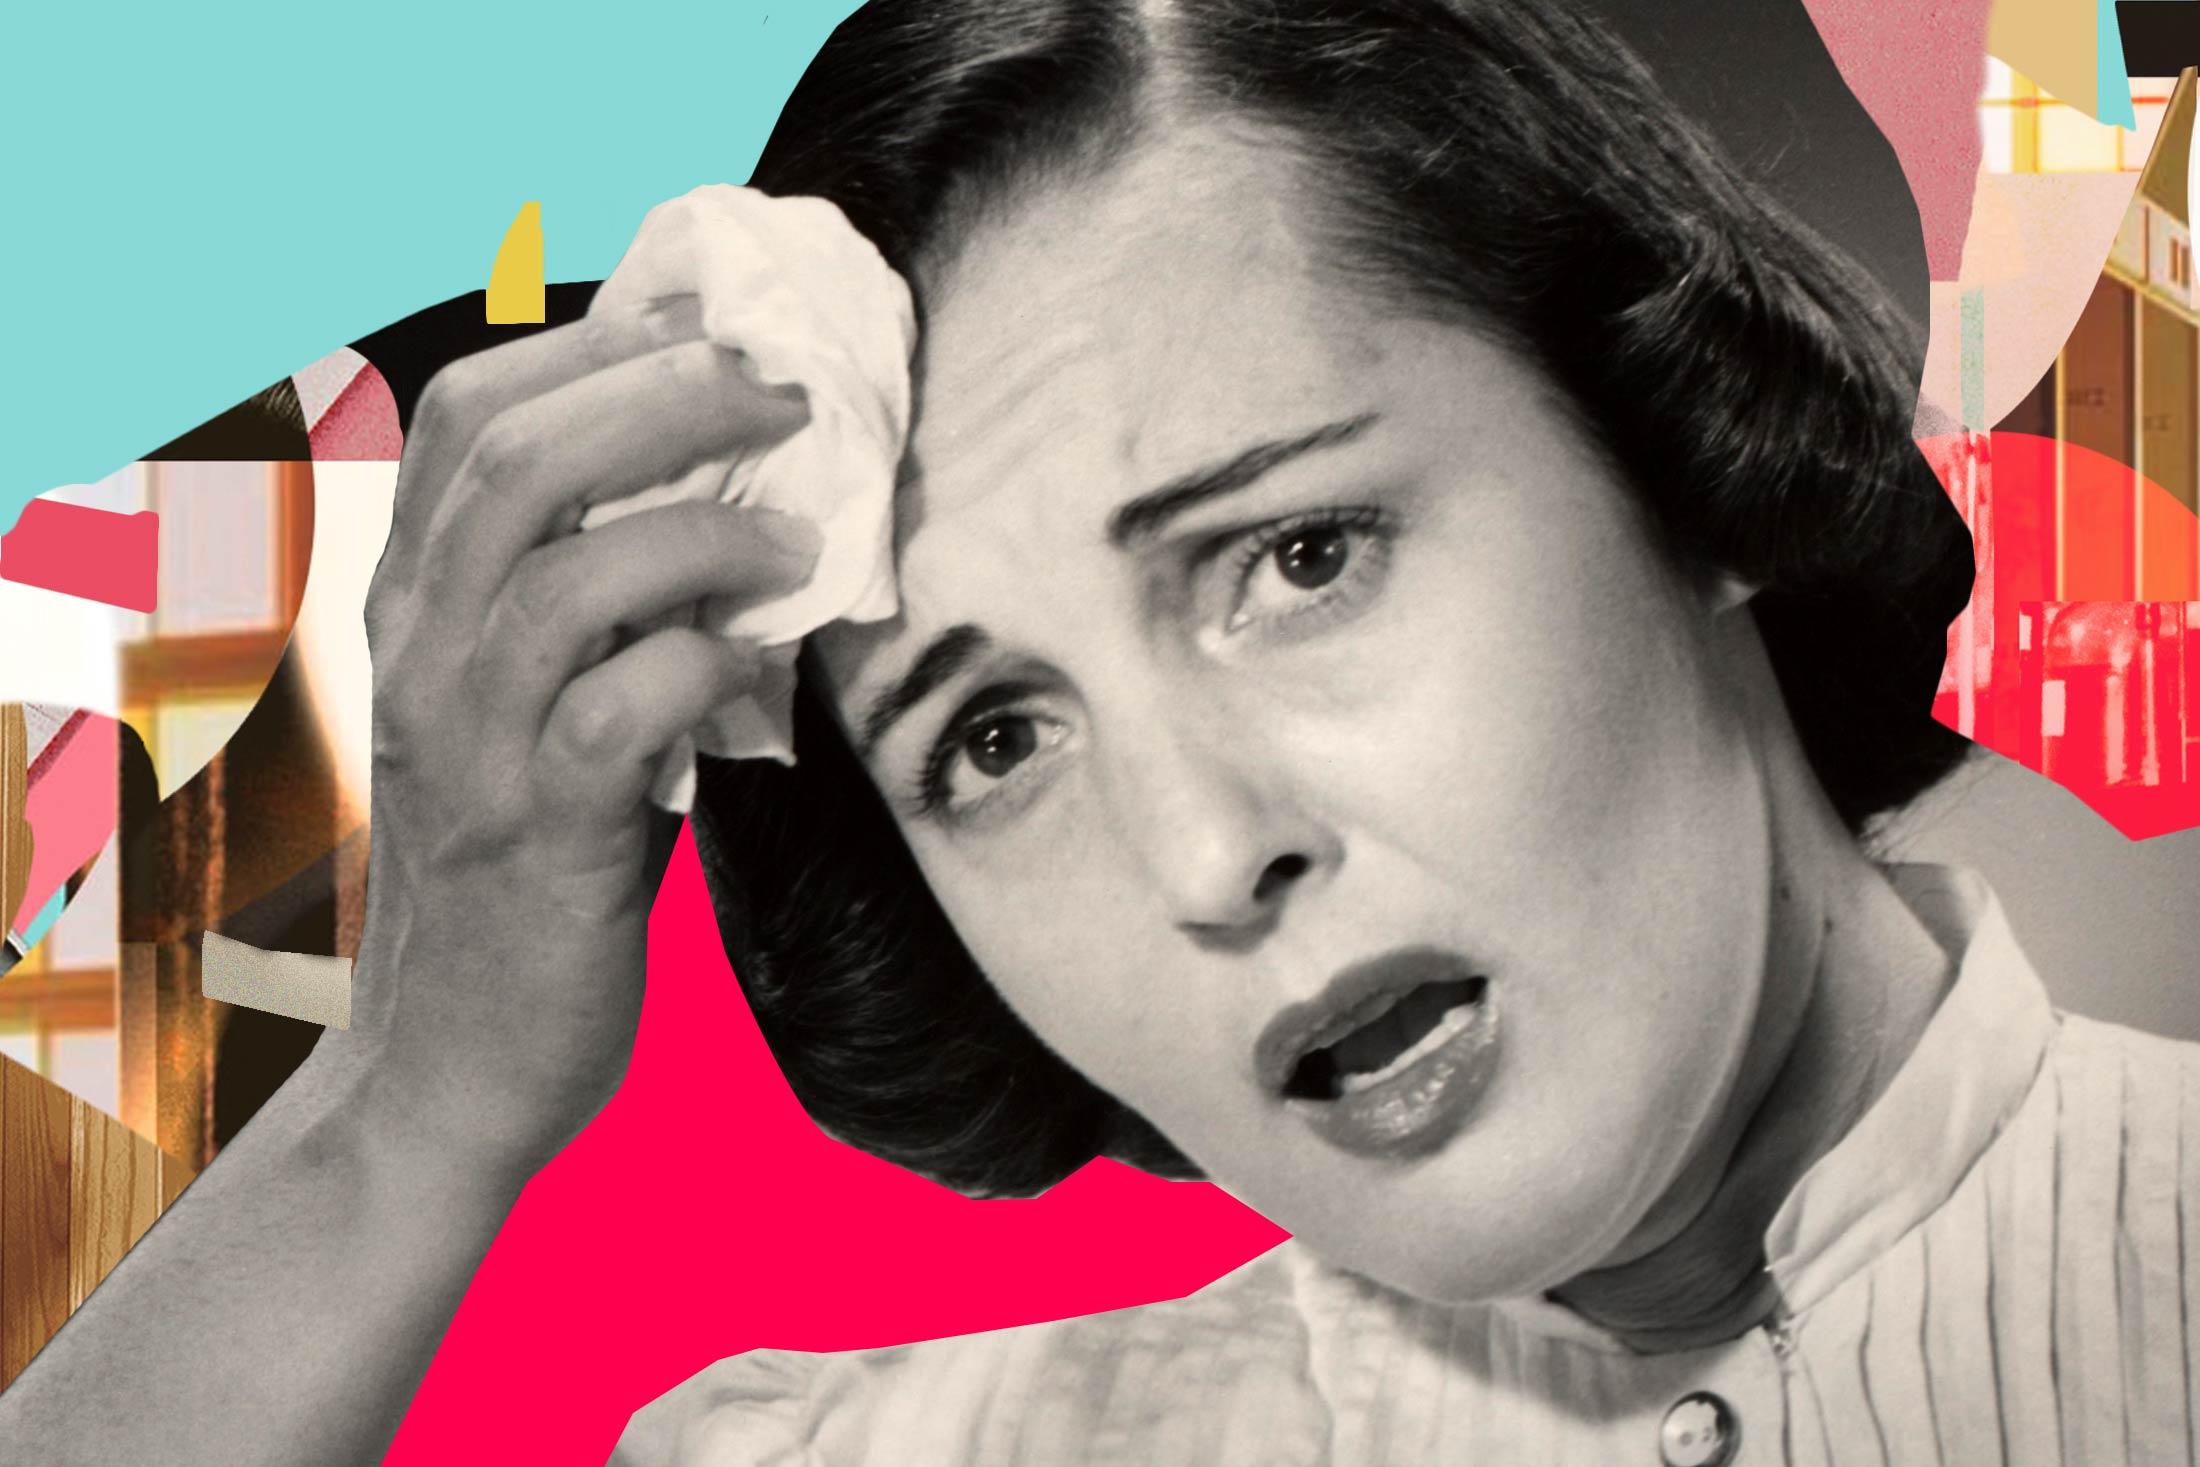 Worried woman wiping brow.